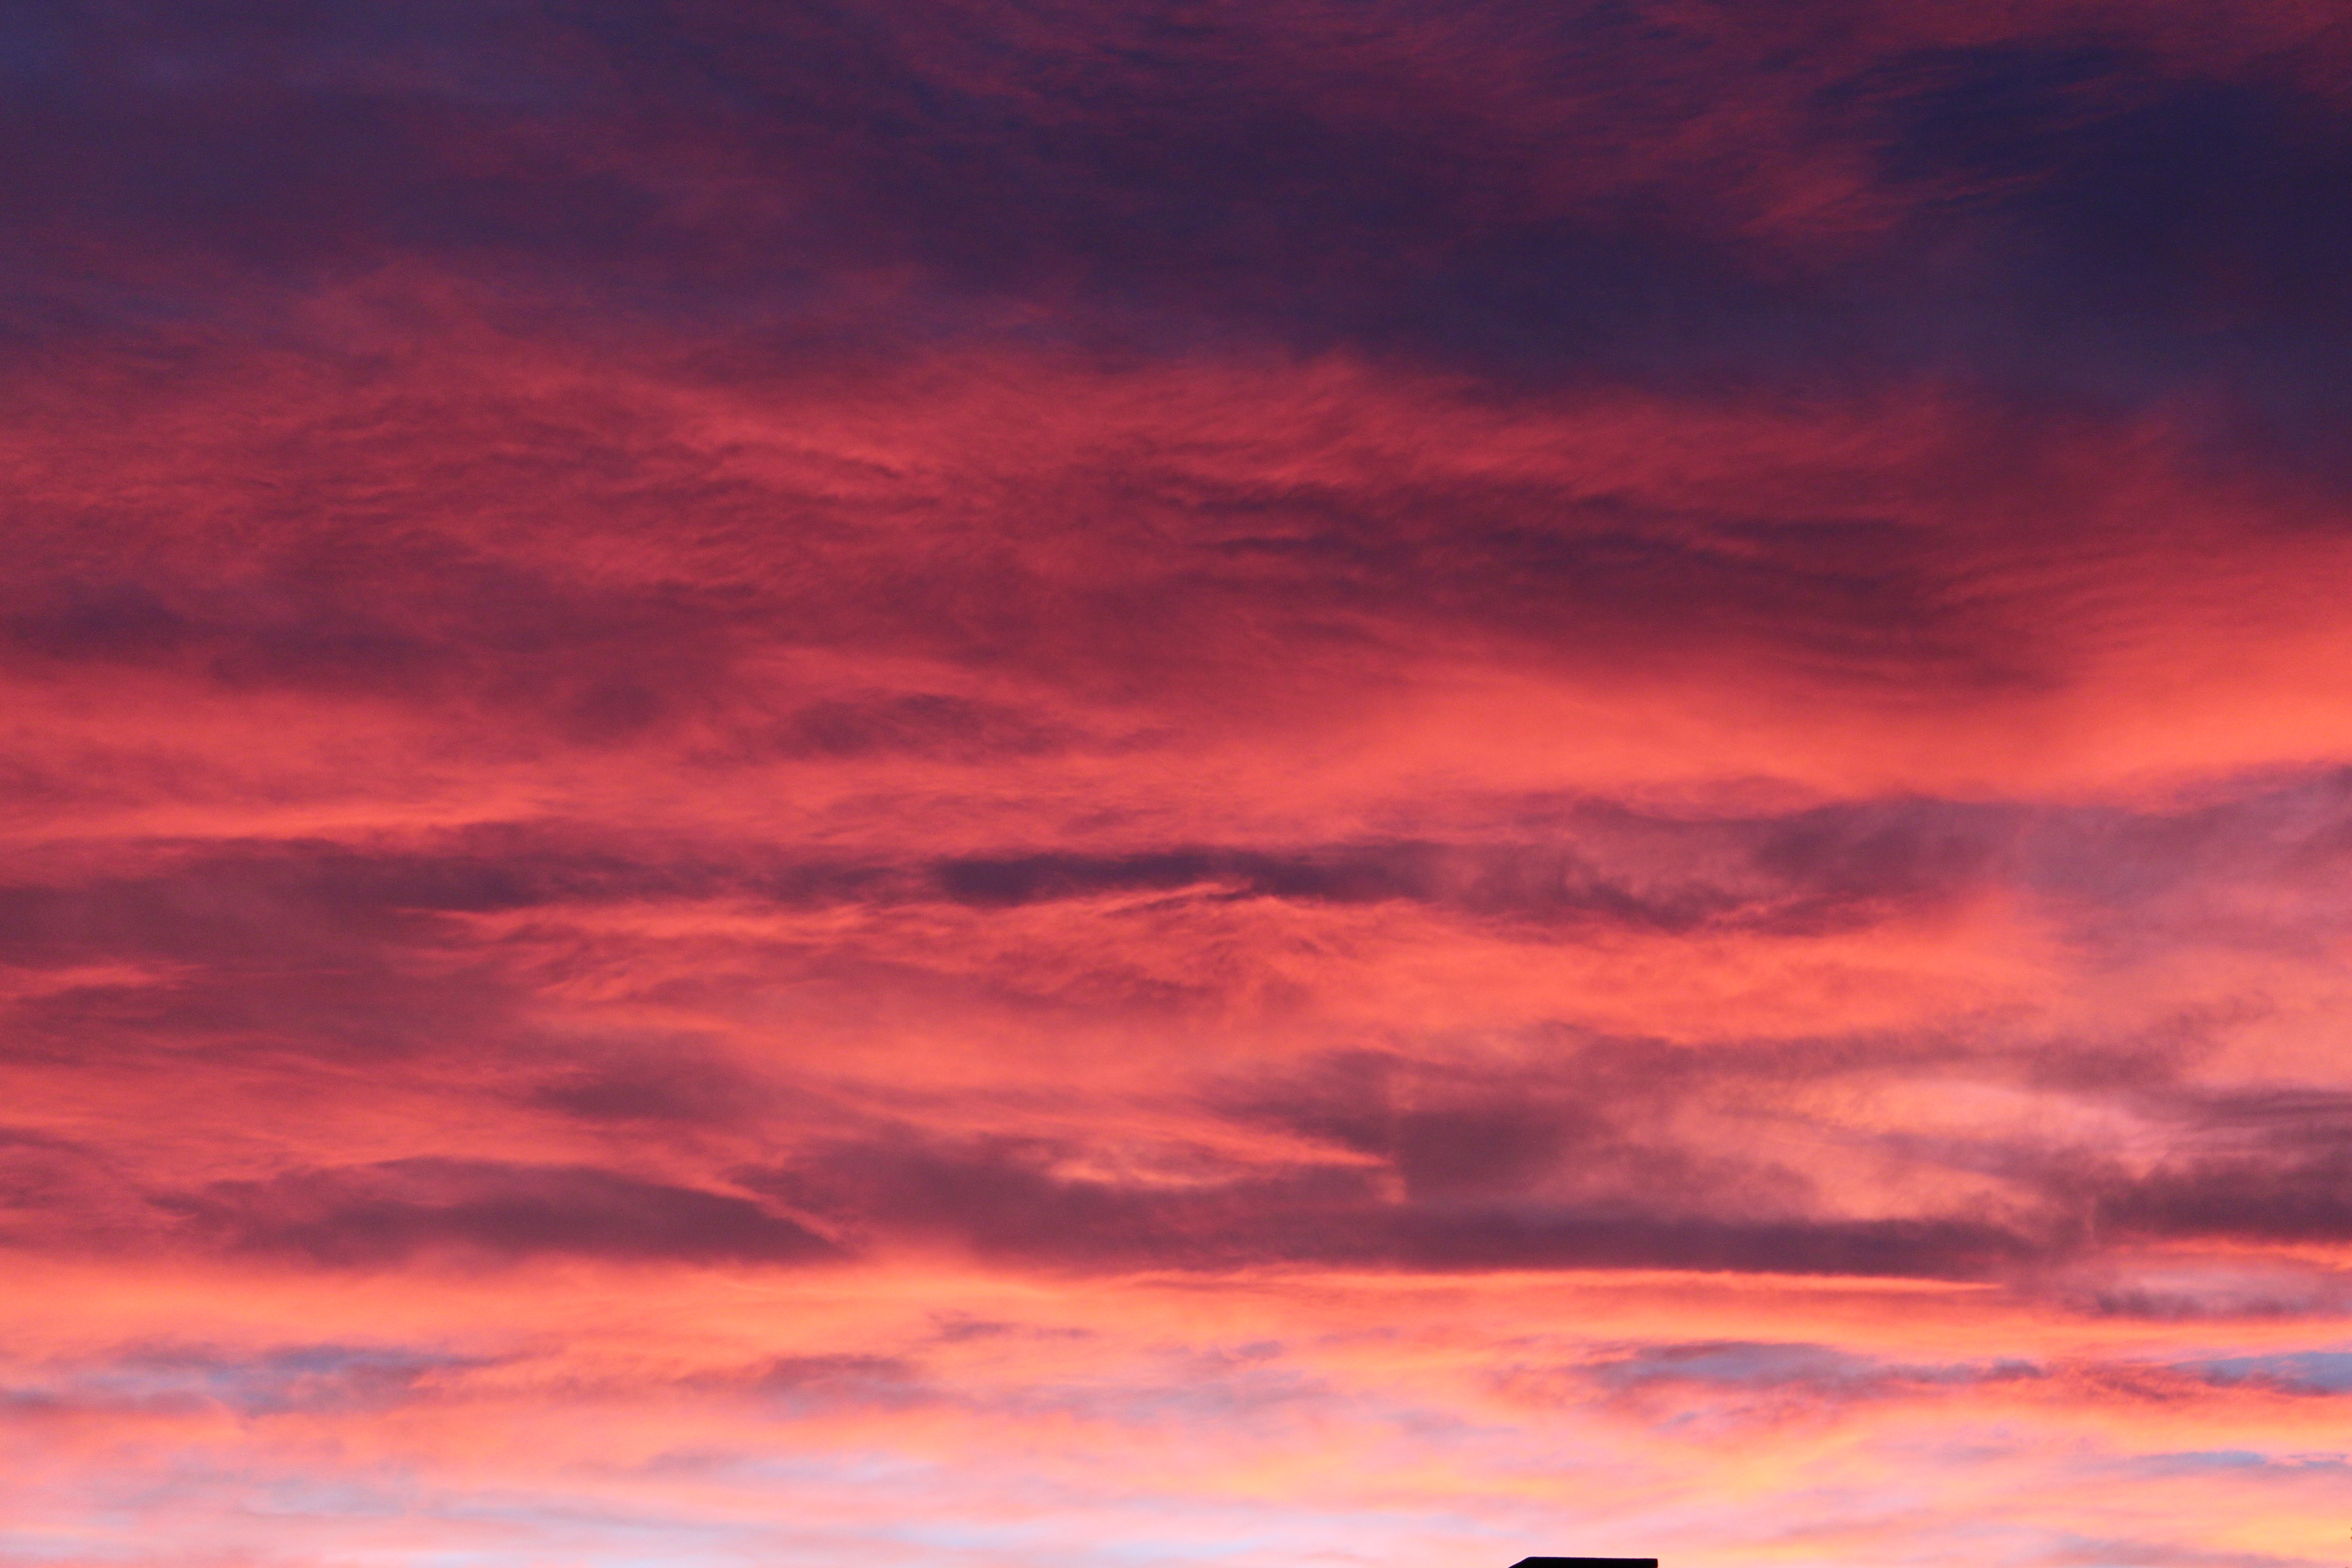 blue sky, red sunset, white clouds essay Downloads free images : landscape, nature, horizon, sun, sunset, sunlight, dawn, atmosphere, dusk, daytime, weather, blue sky, cloud cover, landscapes, thunderstorm.